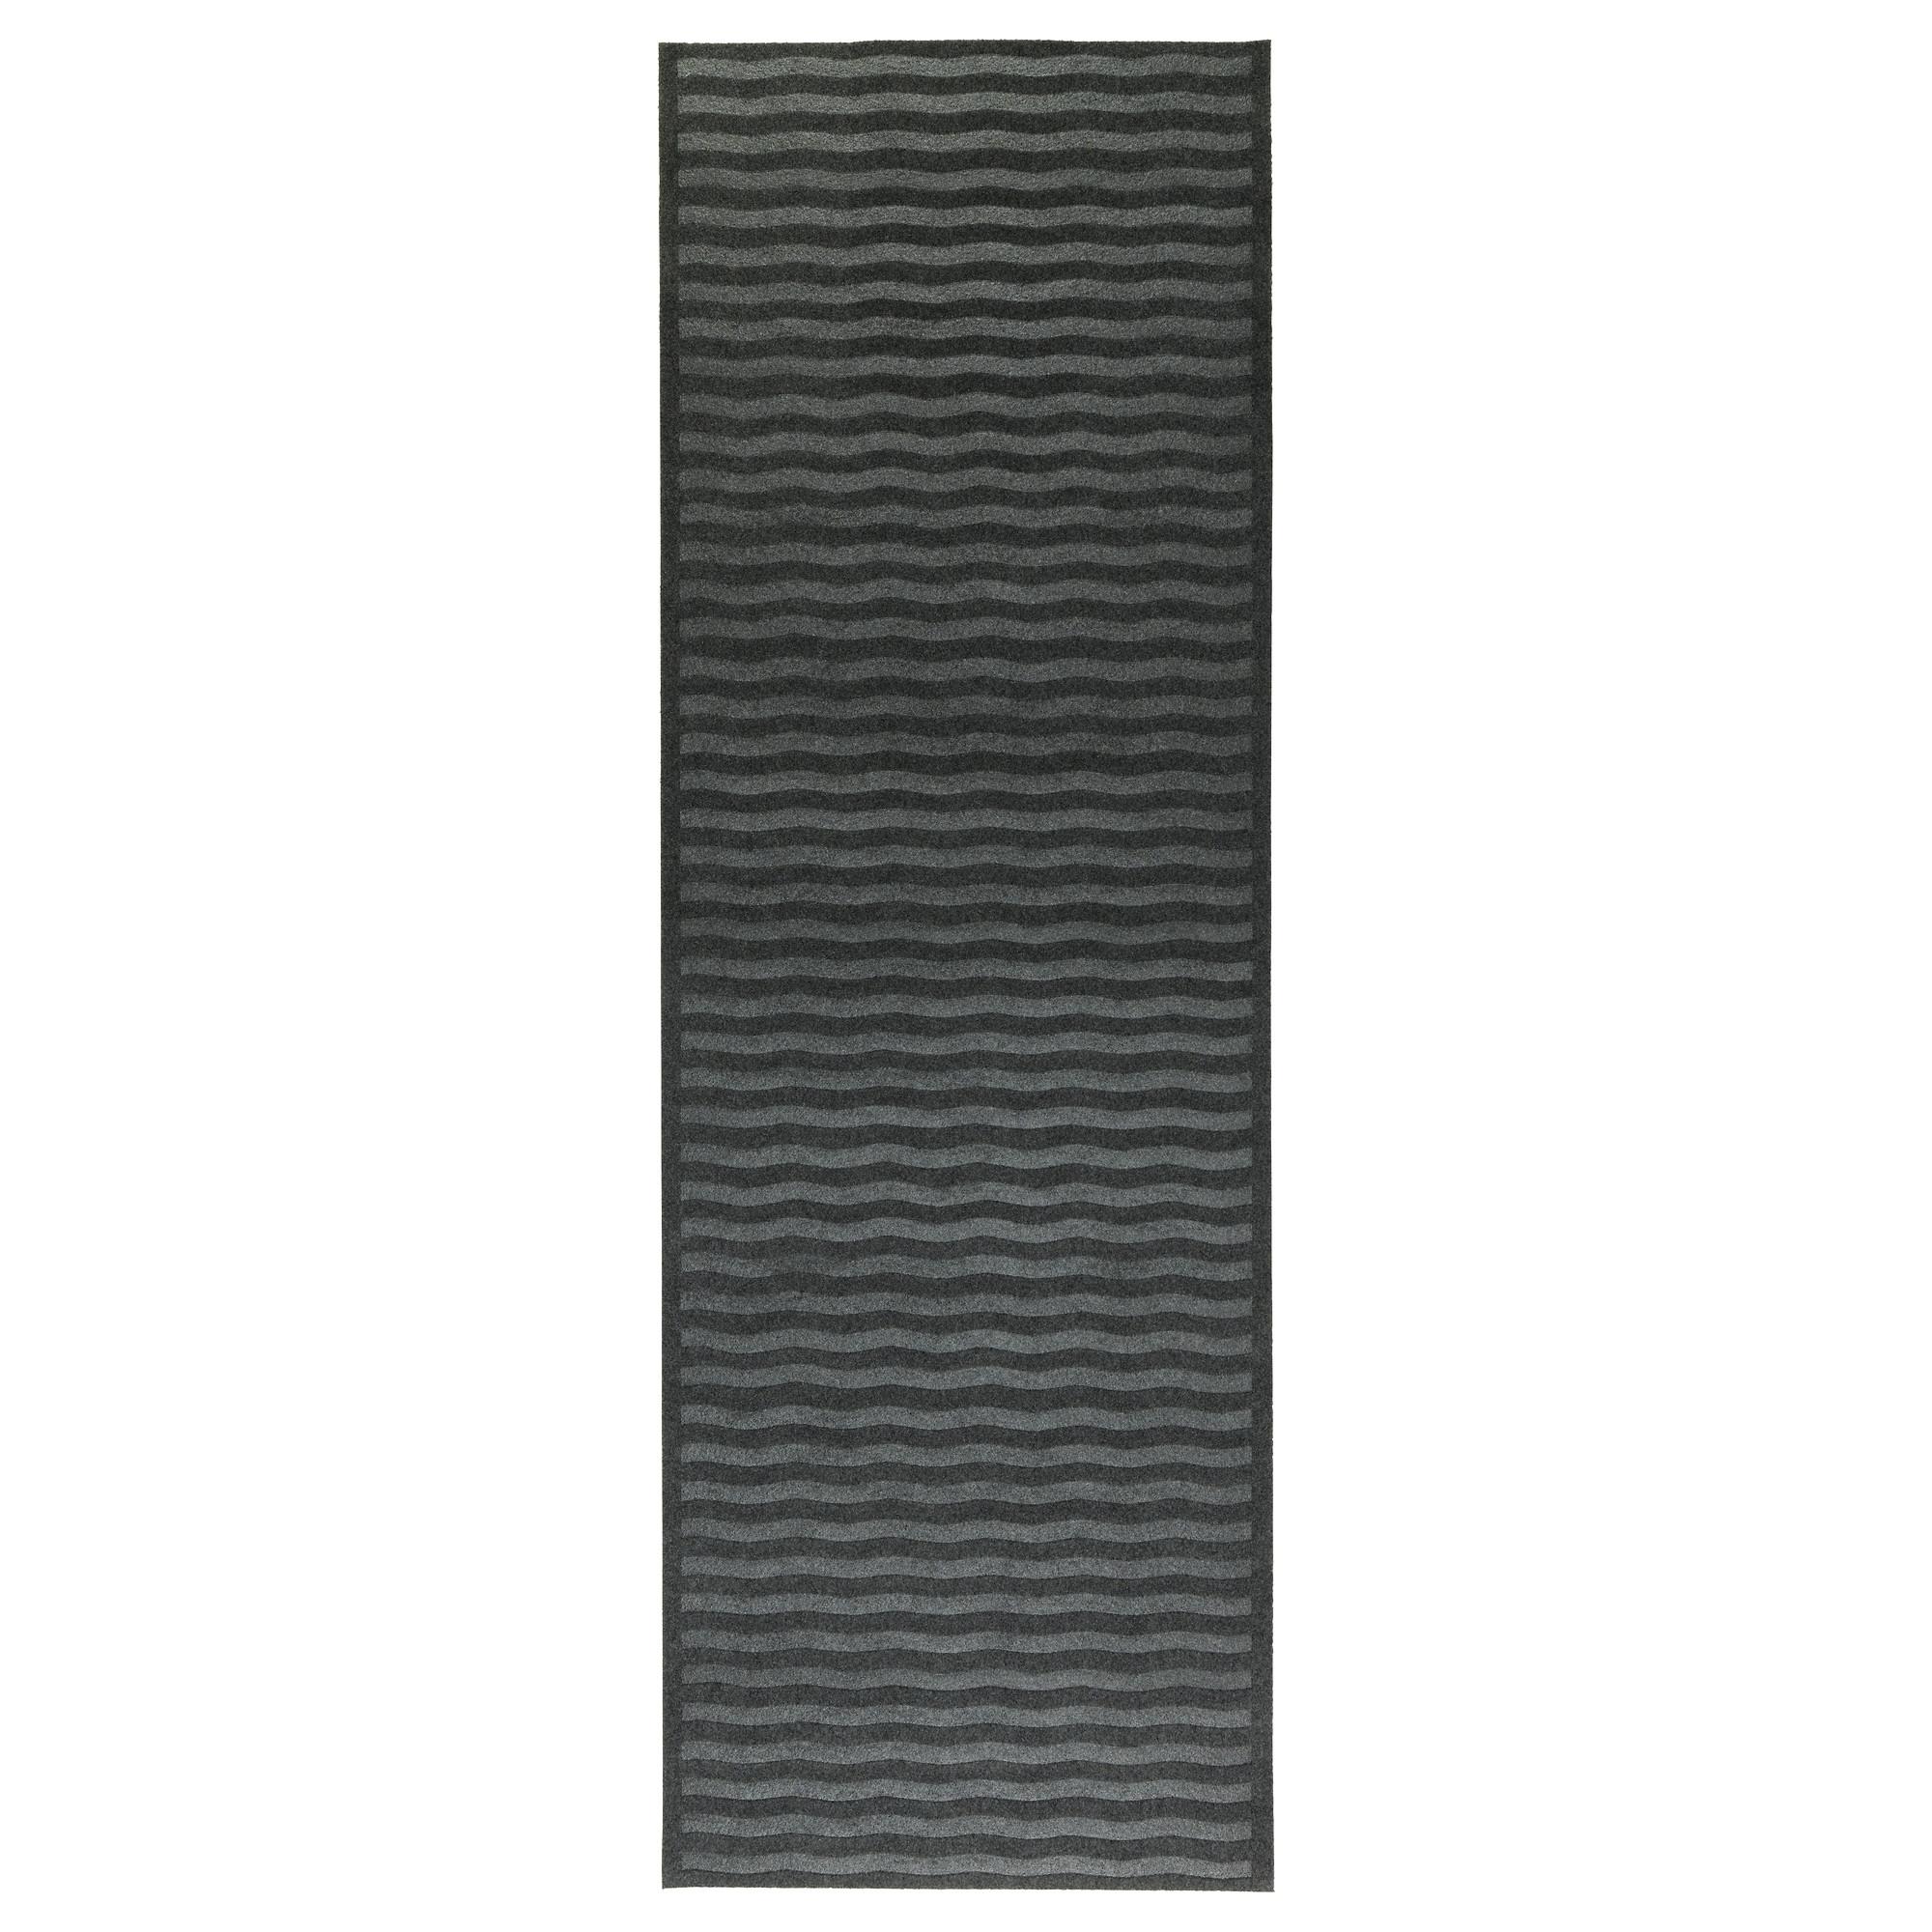 Lyn s alfombra lisa - Antideslizante alfombras ikea ...